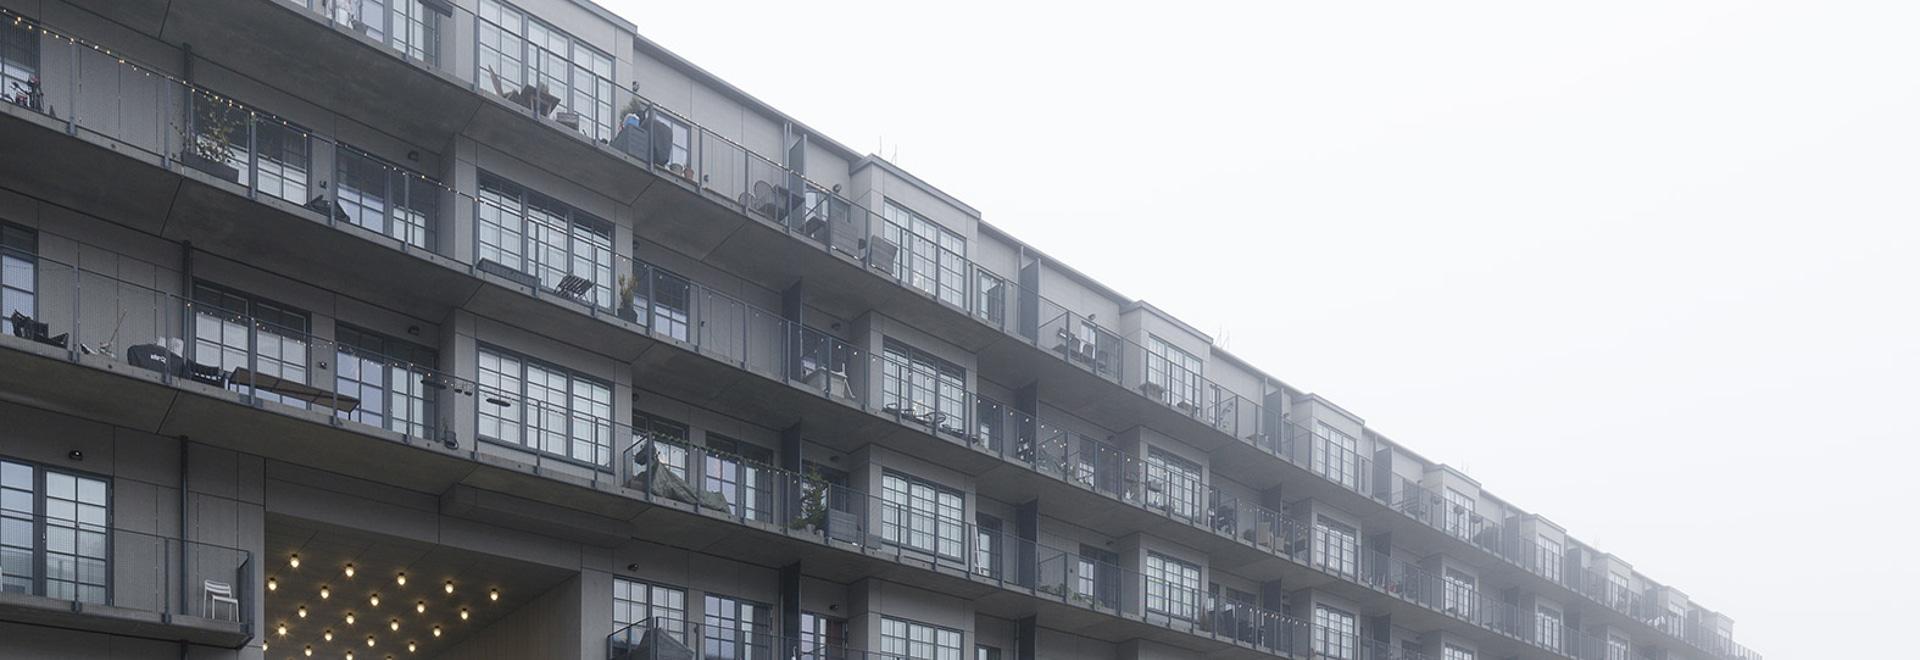 Immeuble d'habitation